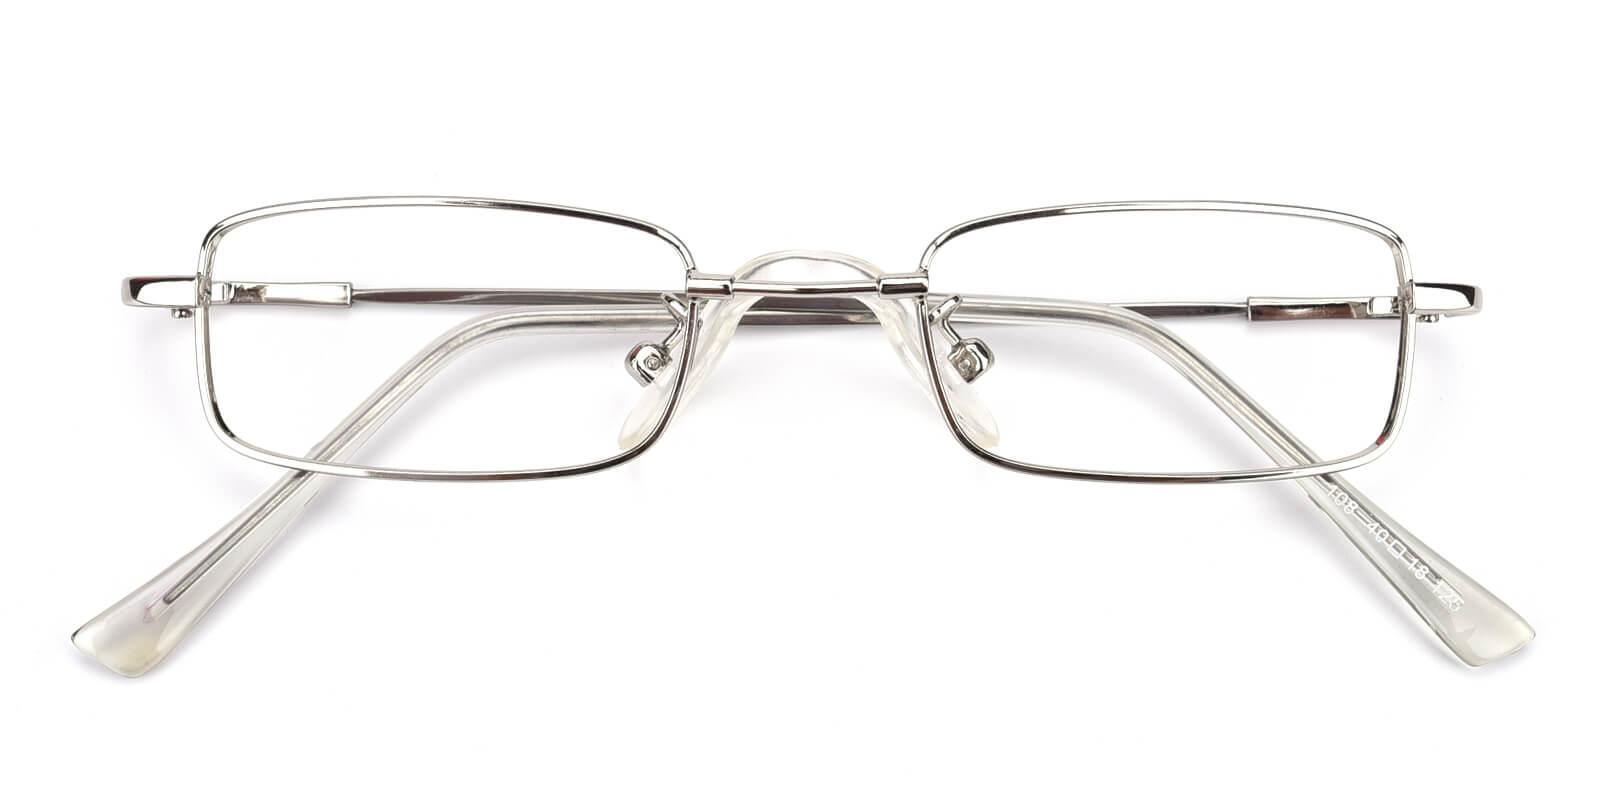 Lanscripe-Silver-Rectangle-Titanium-Eyeglasses-detail